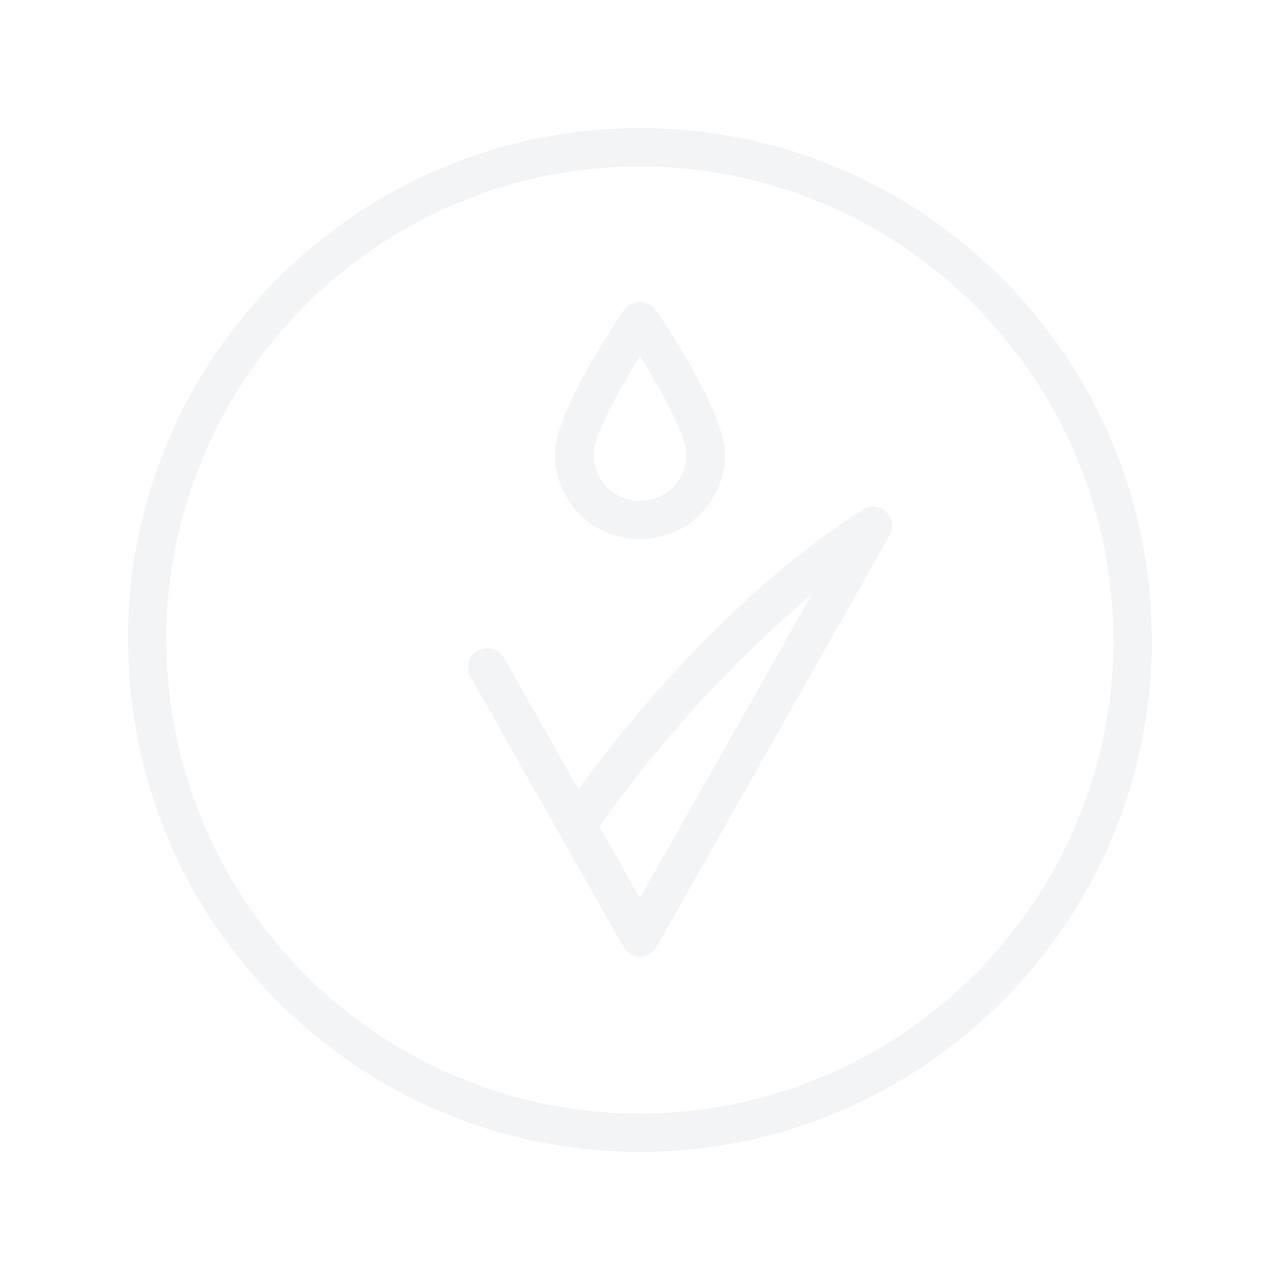 ANNA LOTAN Liquid Gold Golden Night Cream 50ml